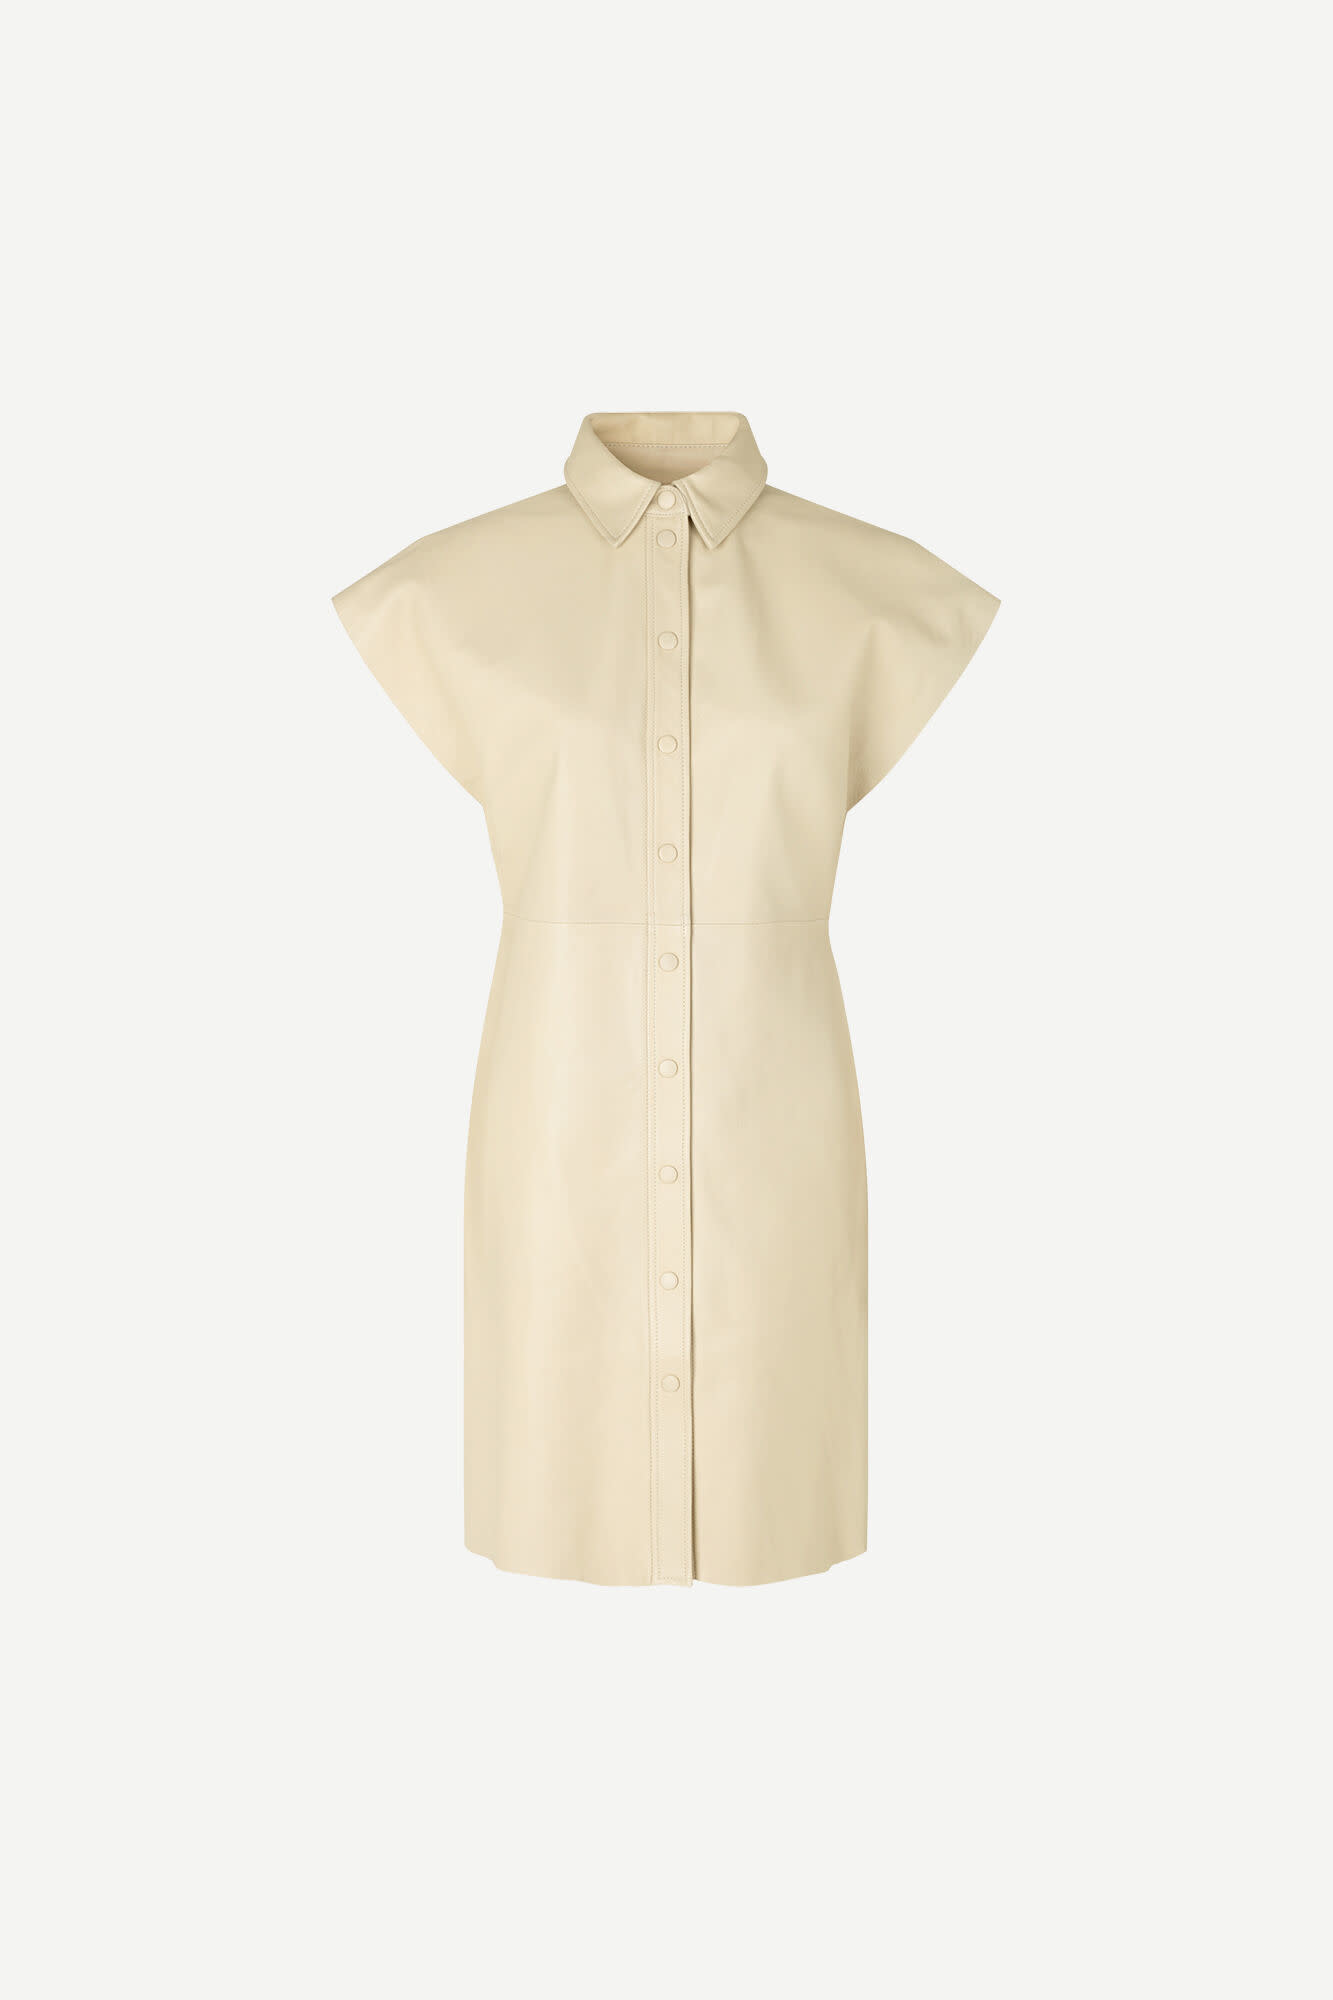 Ariah Rice Brown Leather Dress-2